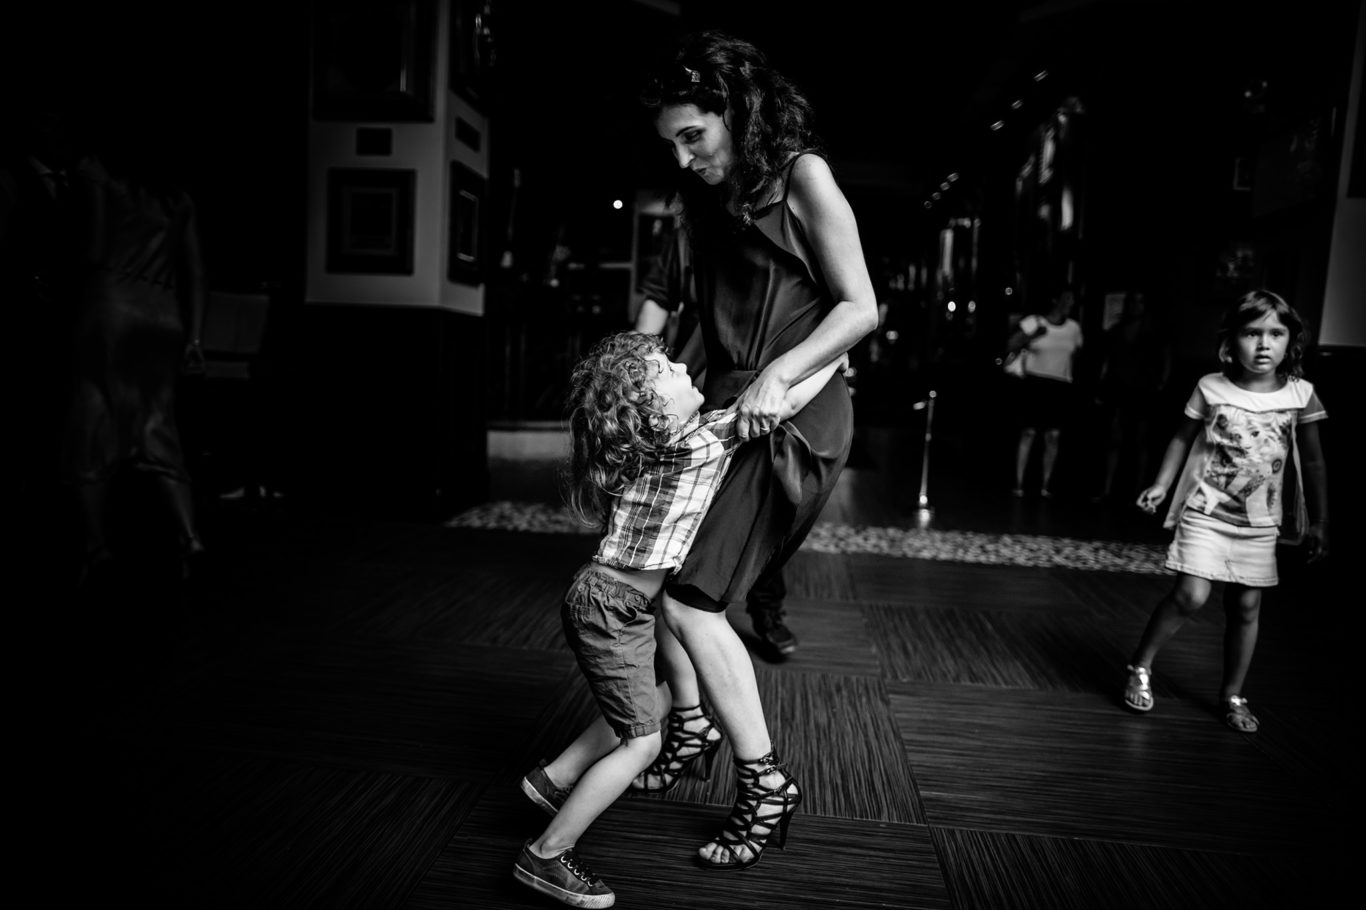 0623-fotografie-nunta-bucuresti-rodica-rares-fotograf-ciprian-dumitrescu-cd2_0421